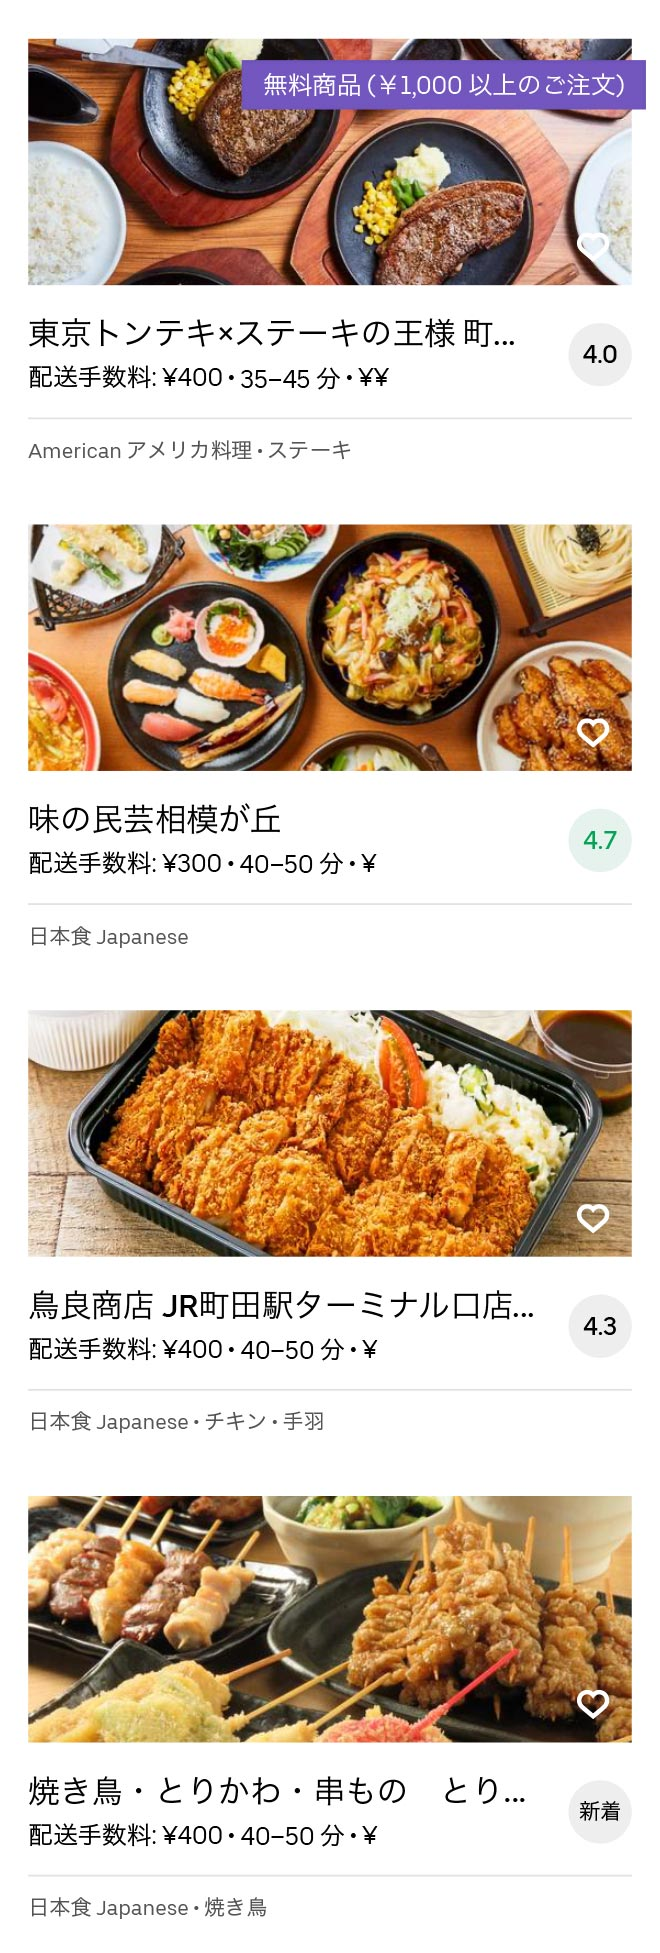 Chuo rinkan menu 2008 11